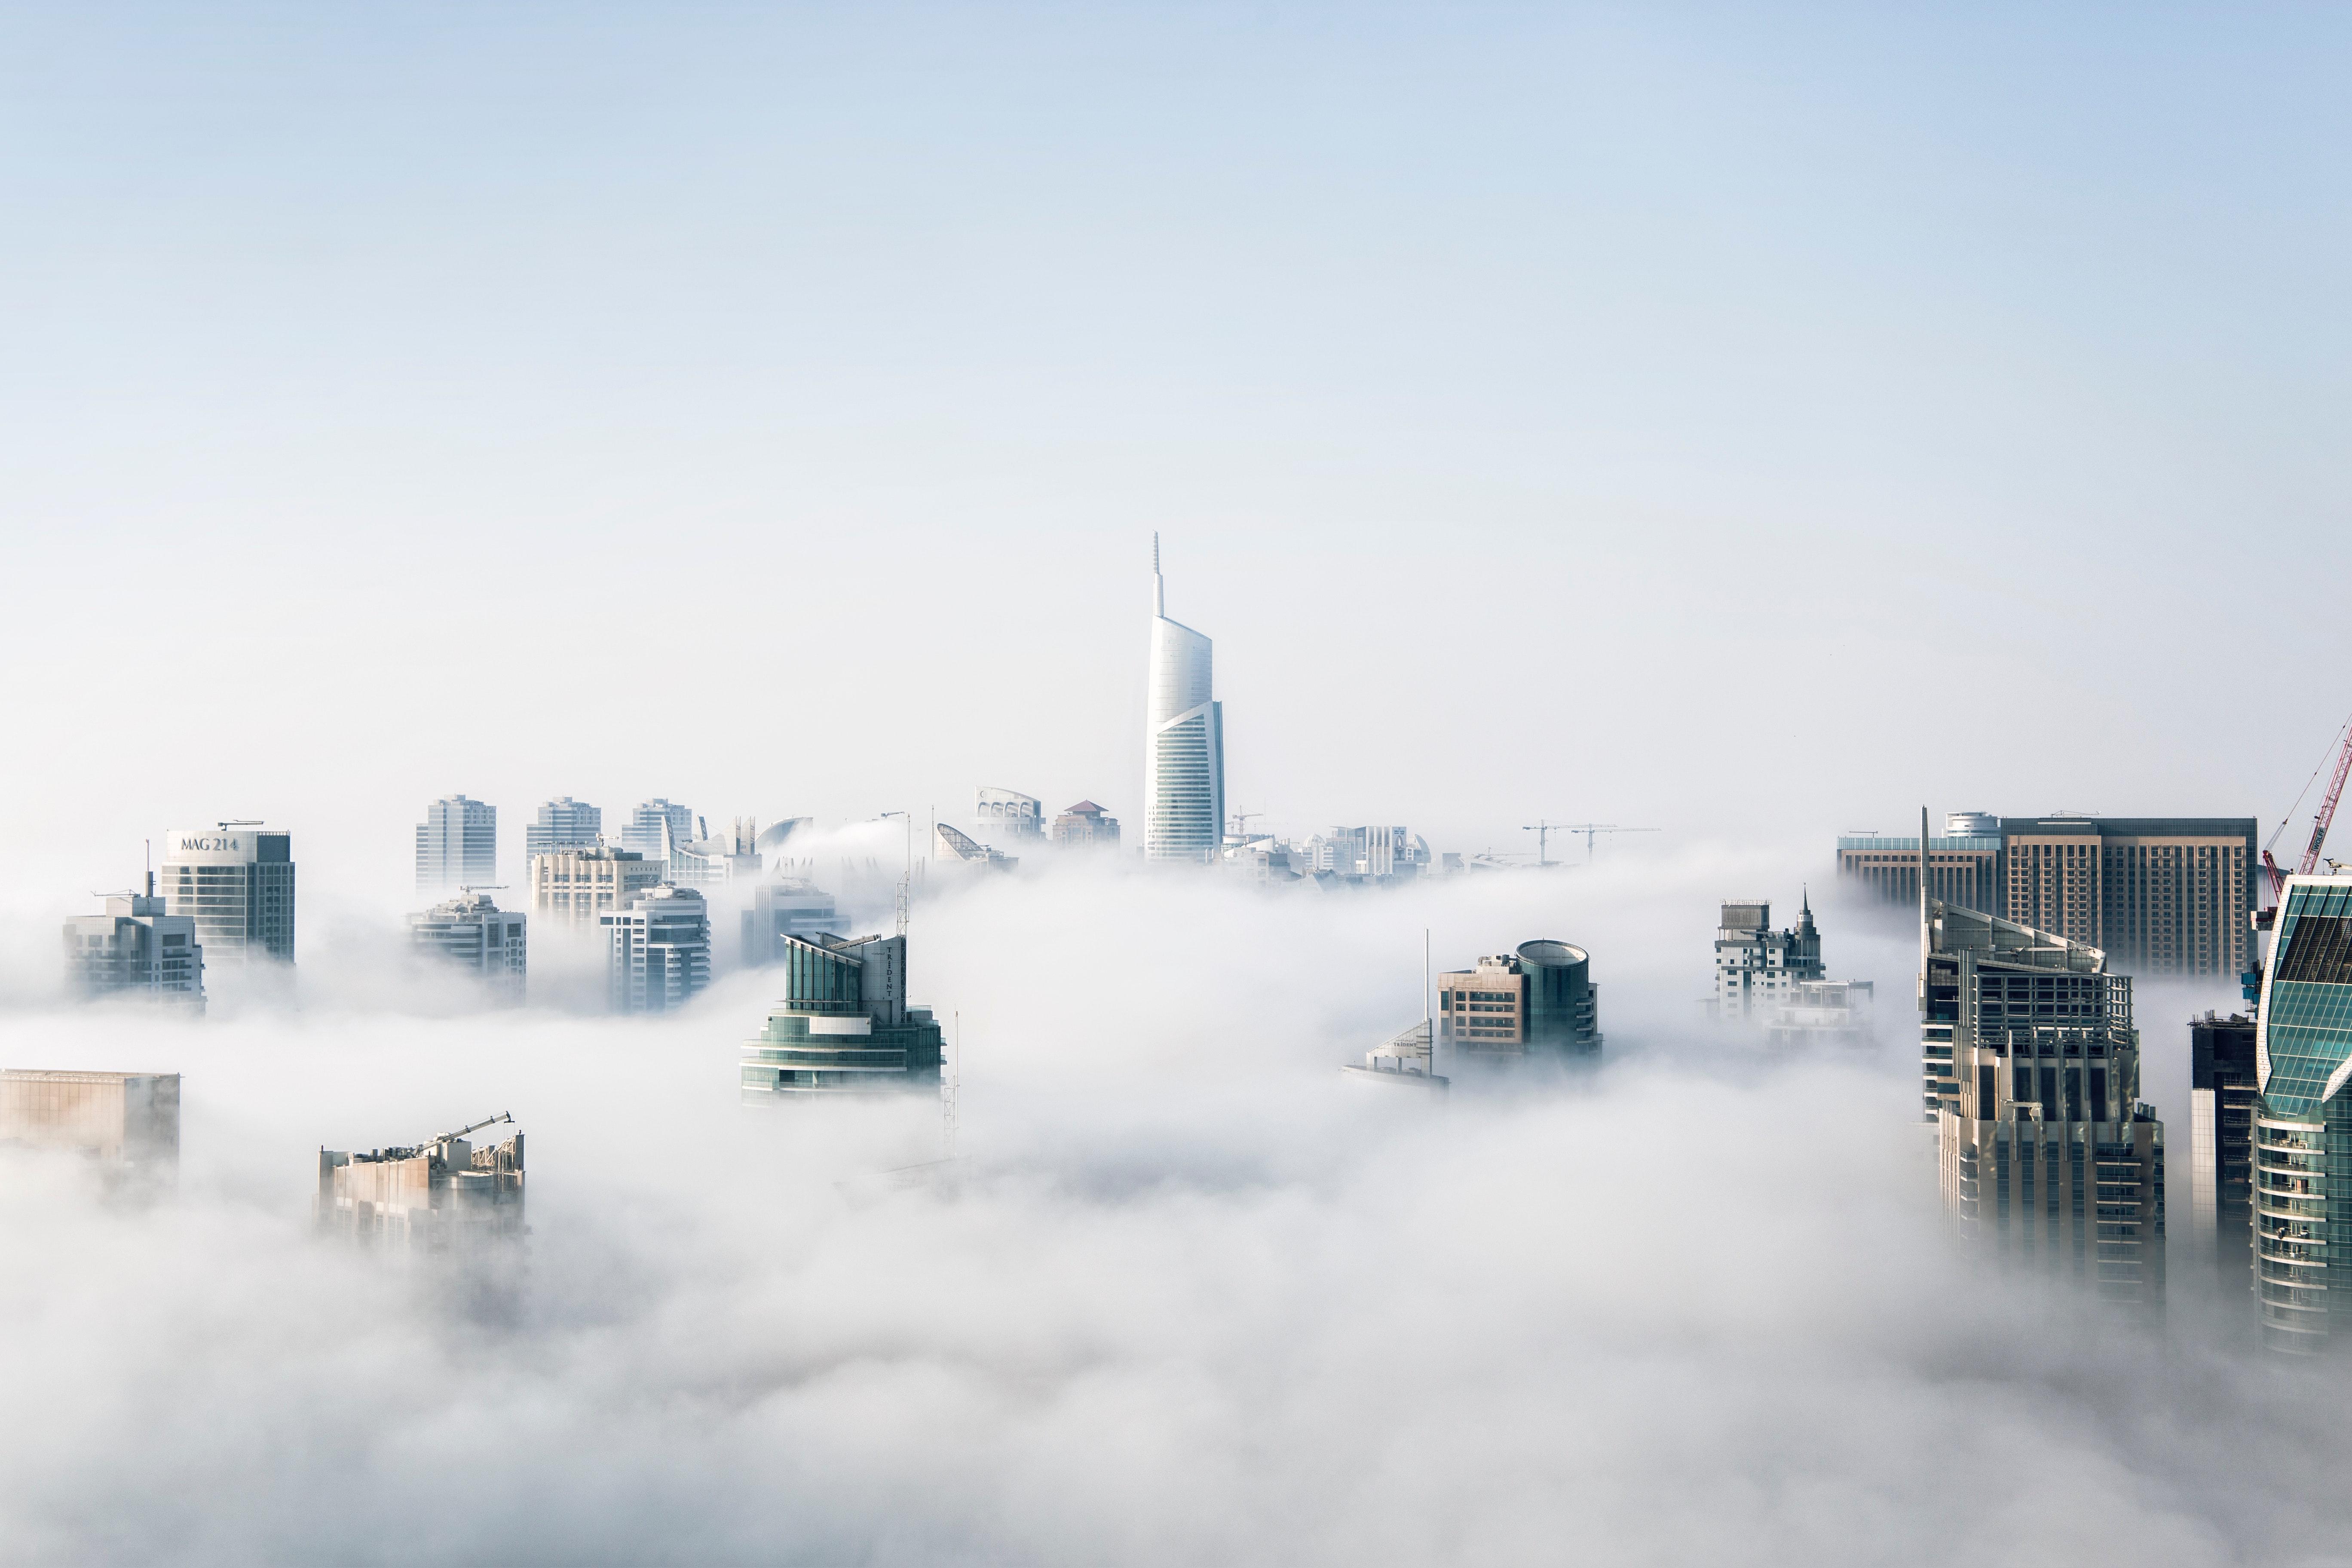 architecture-buildings-city-325185.jpg